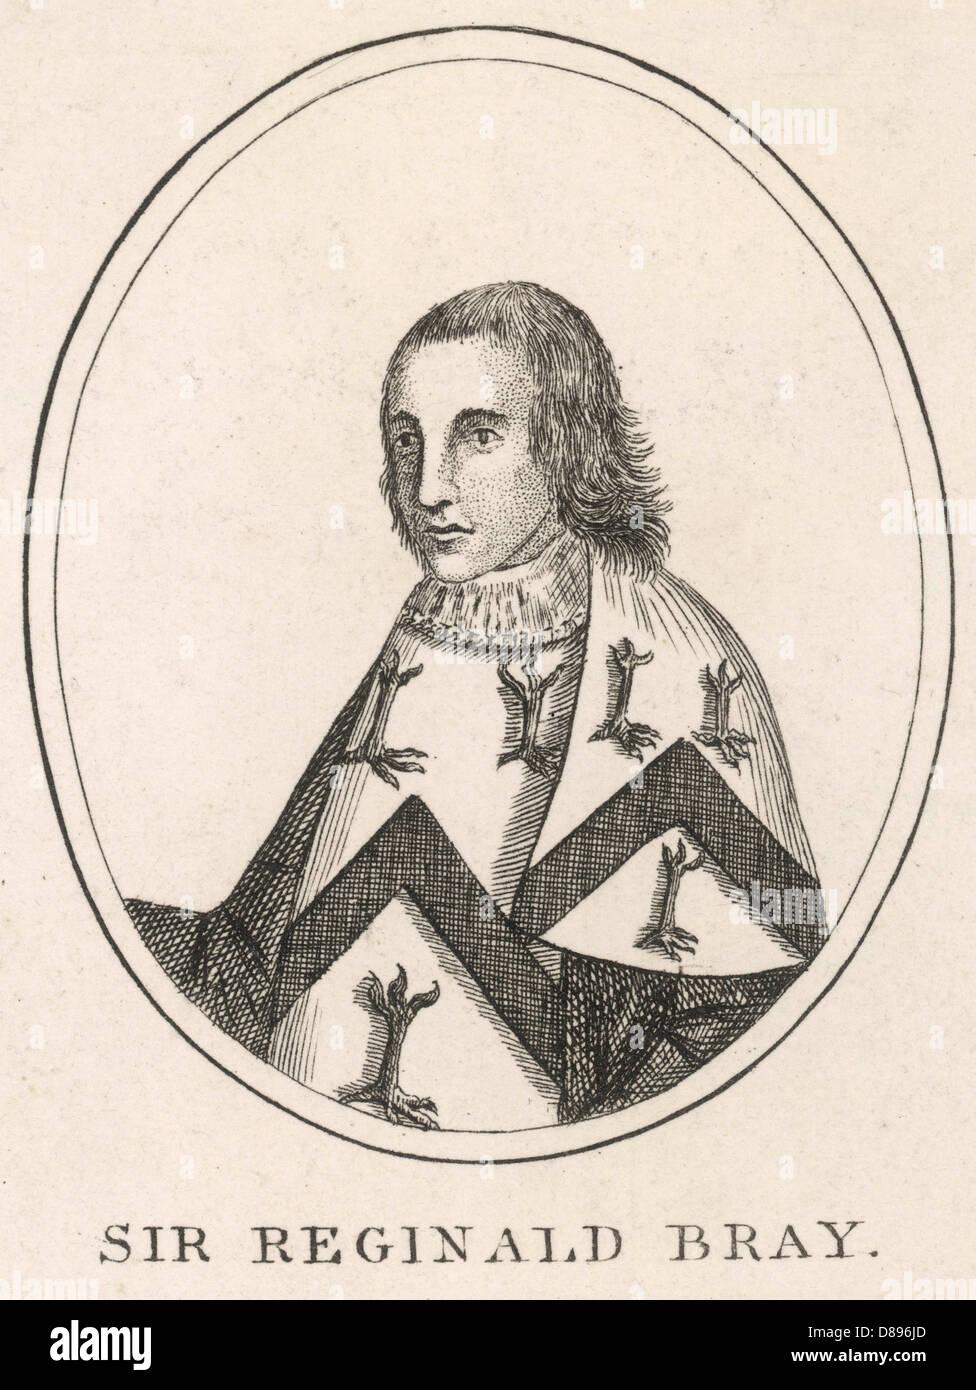 Sir Reginald Bray - Stock Image